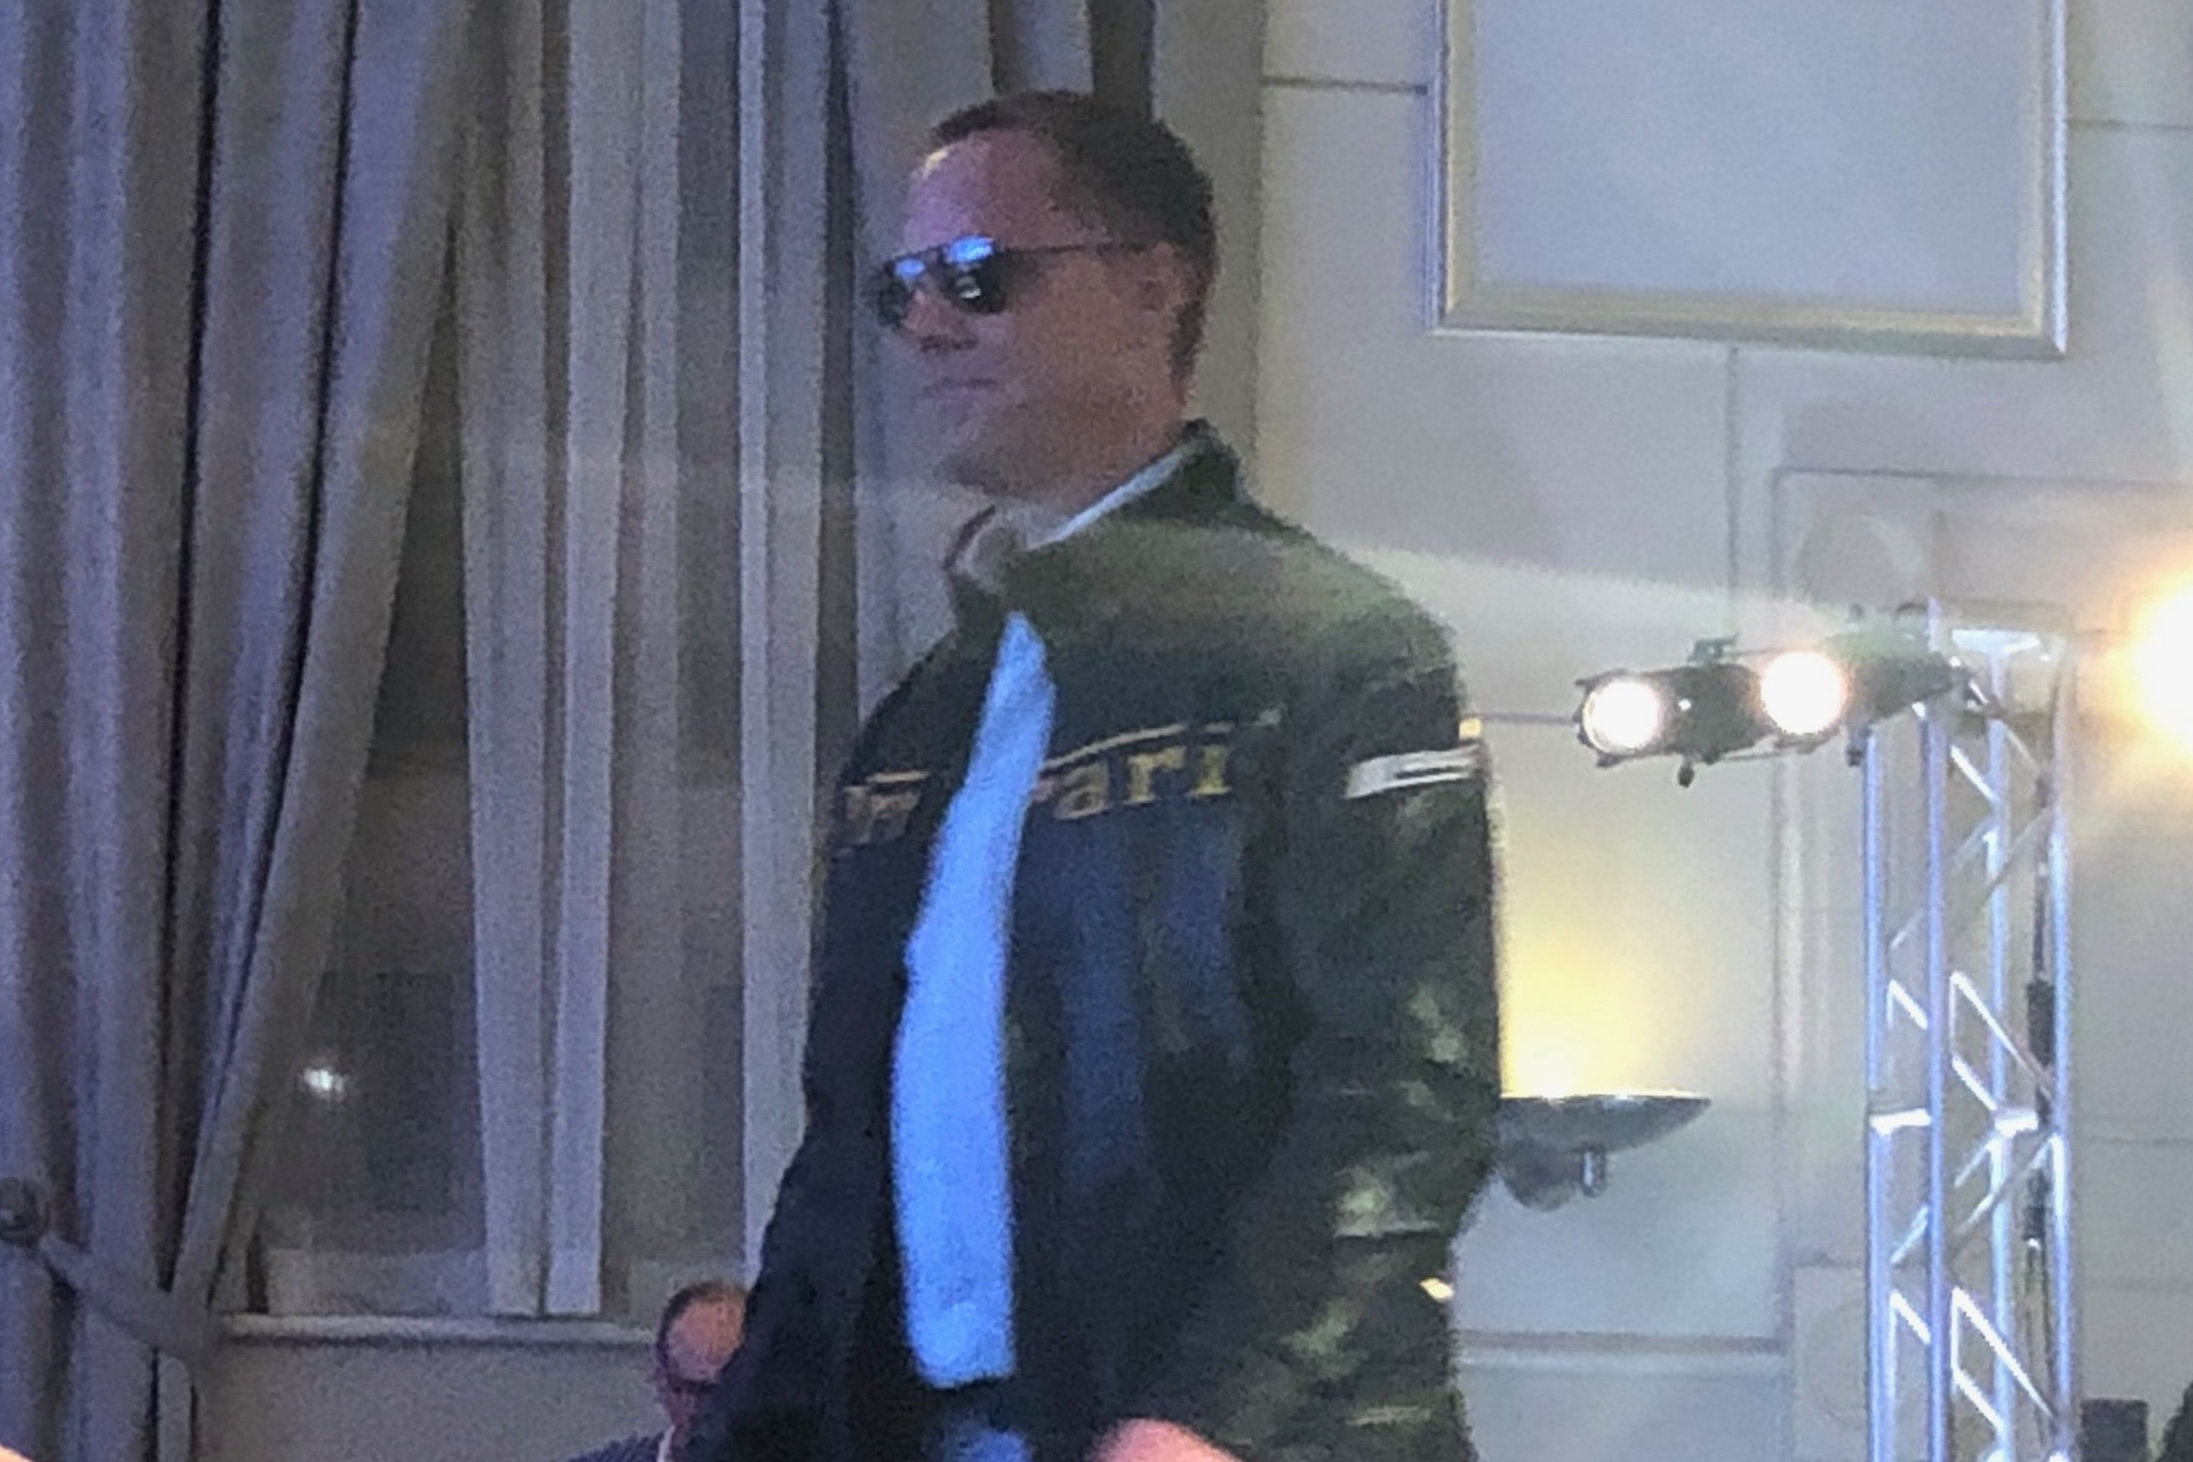 Walter Leather Company donates a custom designed leather jacket similar to this one modeled by Dave Sidlar.